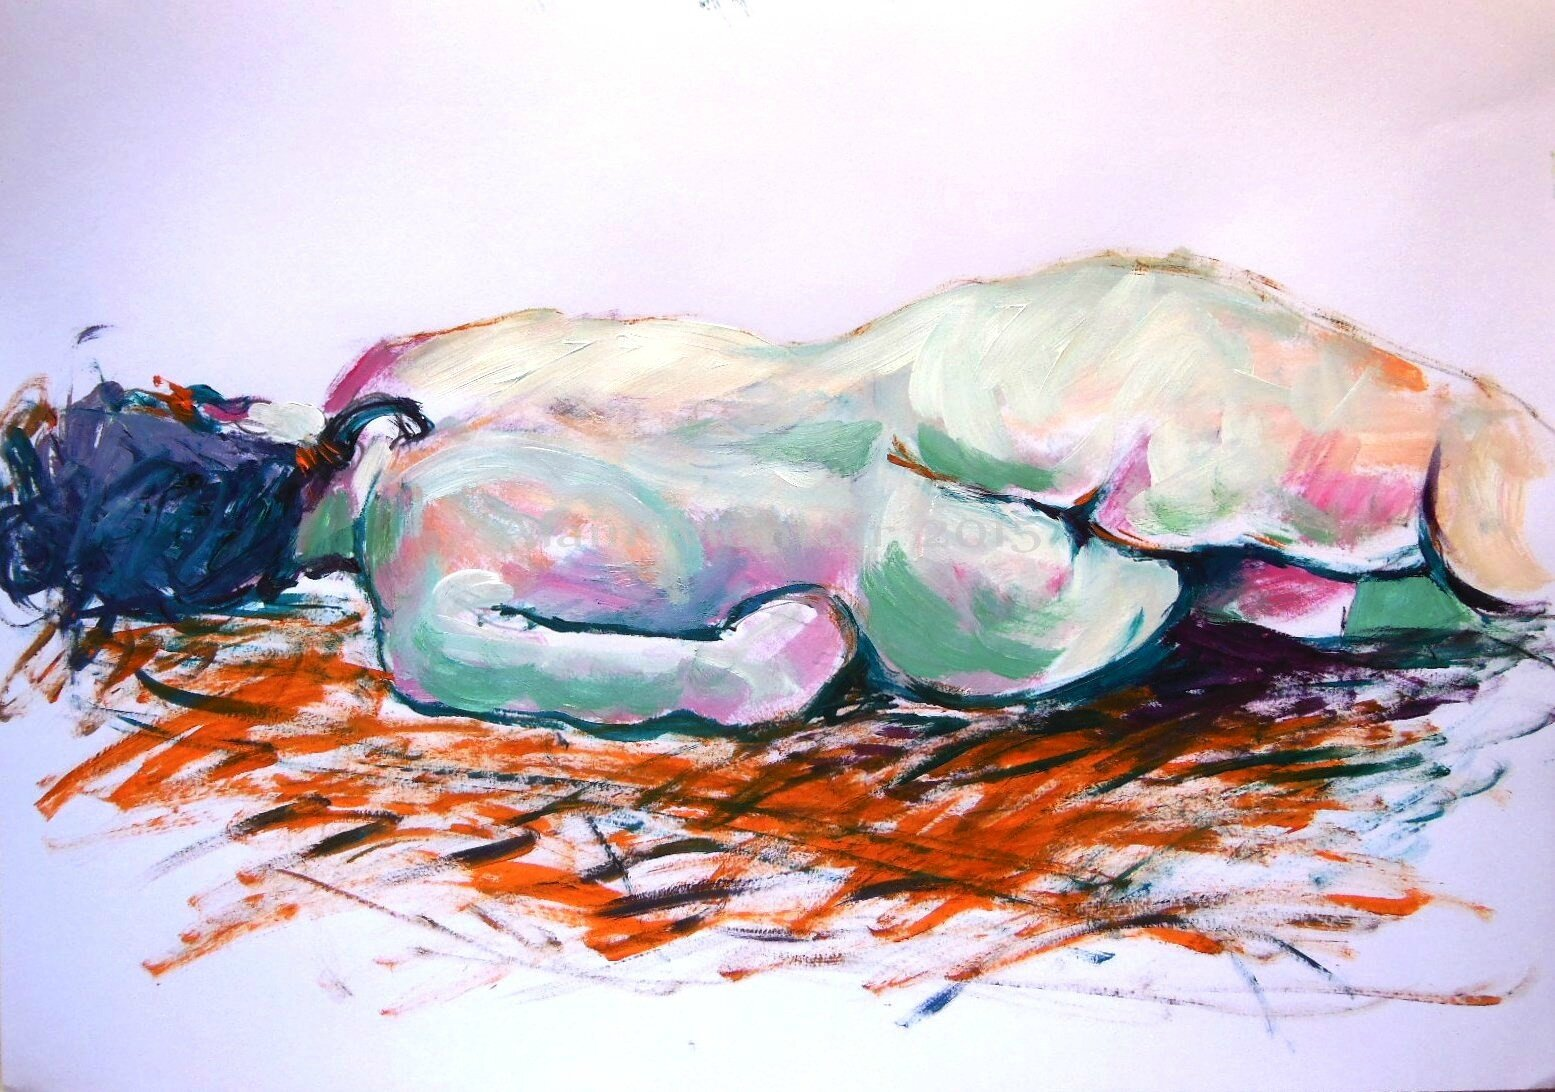 1-Tableau dessin peinture contemporaine nu alain montoir Galerie Avignon (12)